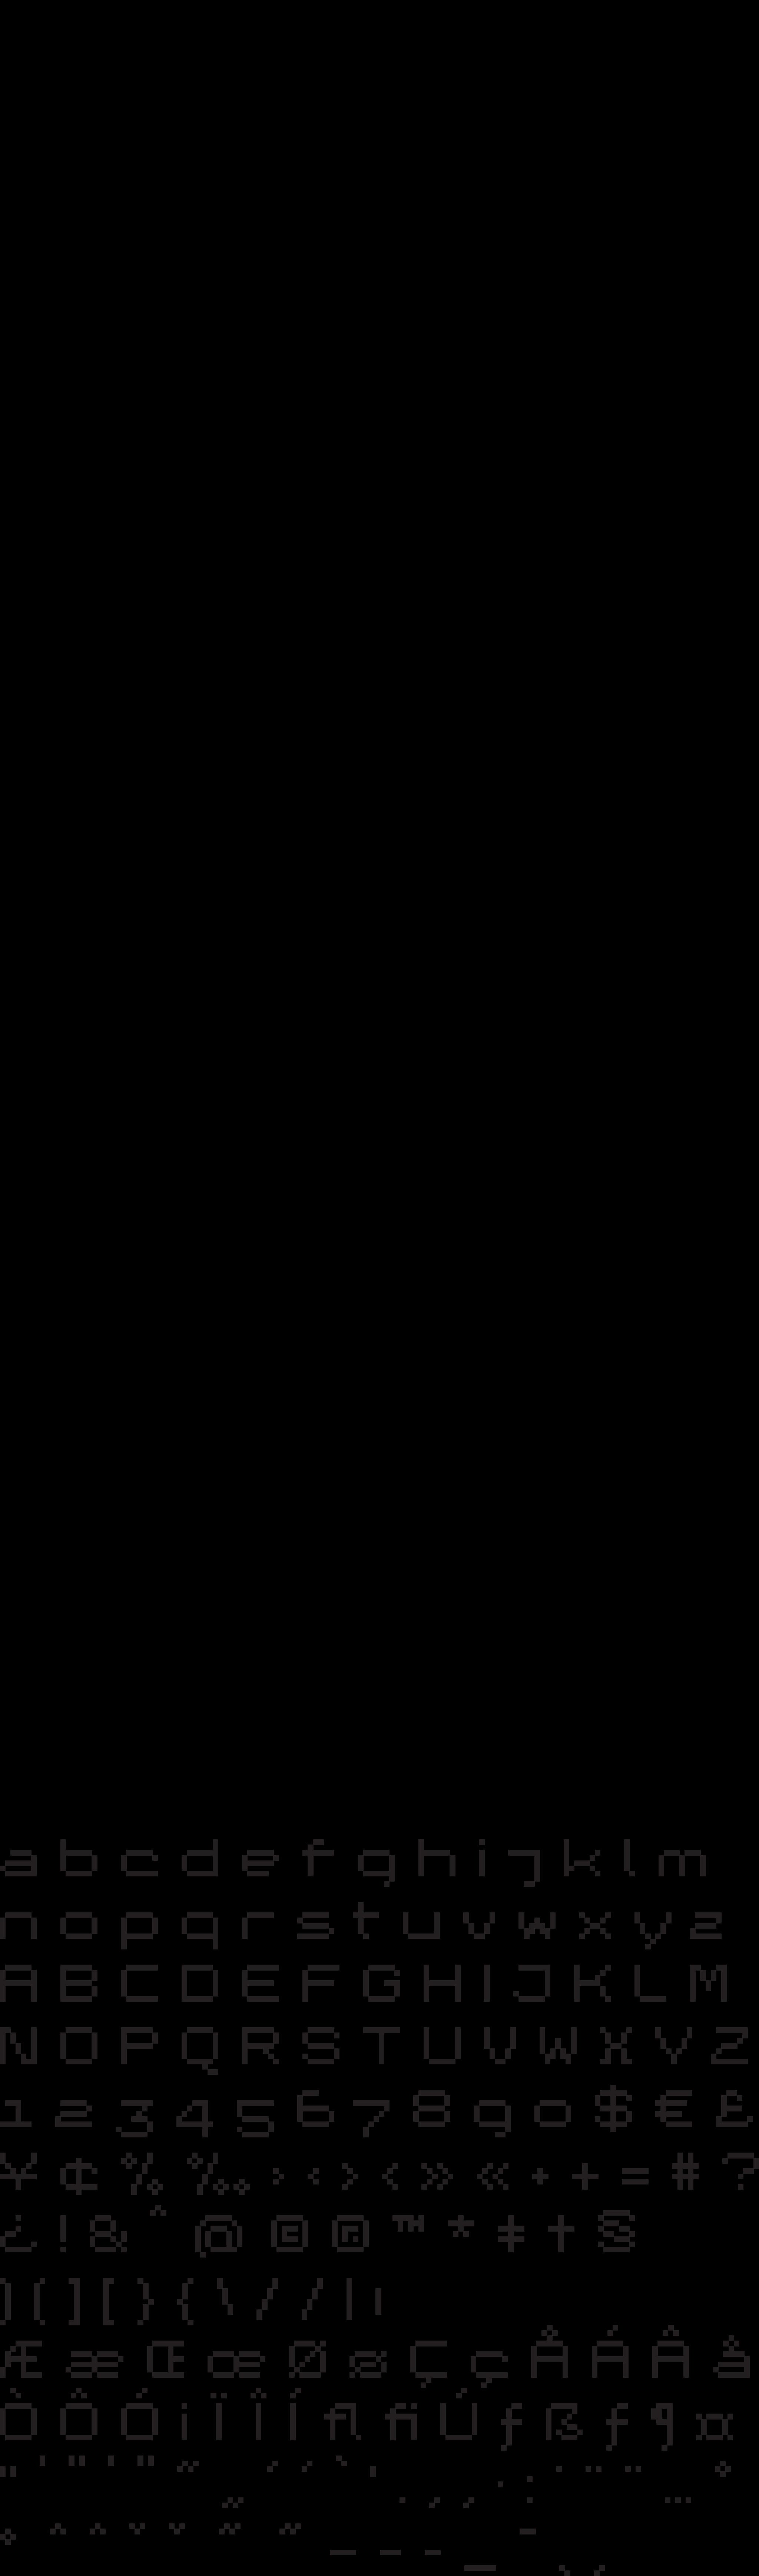 Diphtong-pixel_4-billboard